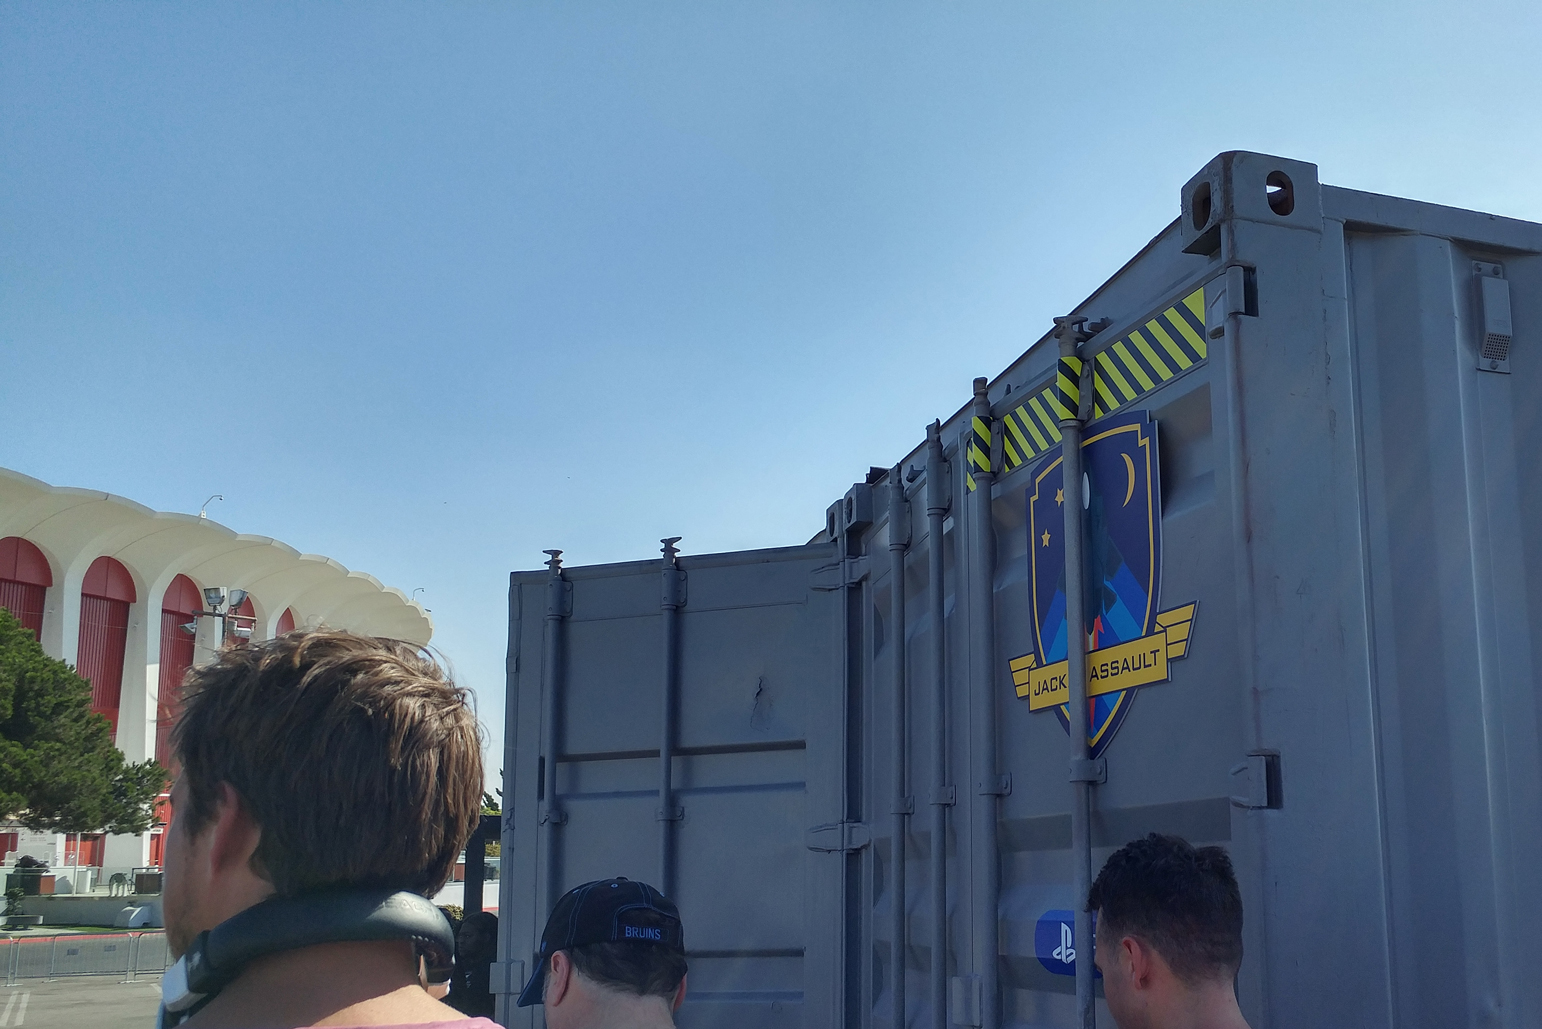 Call of Duty: Infinite Warfare gets multiplayer beta dates